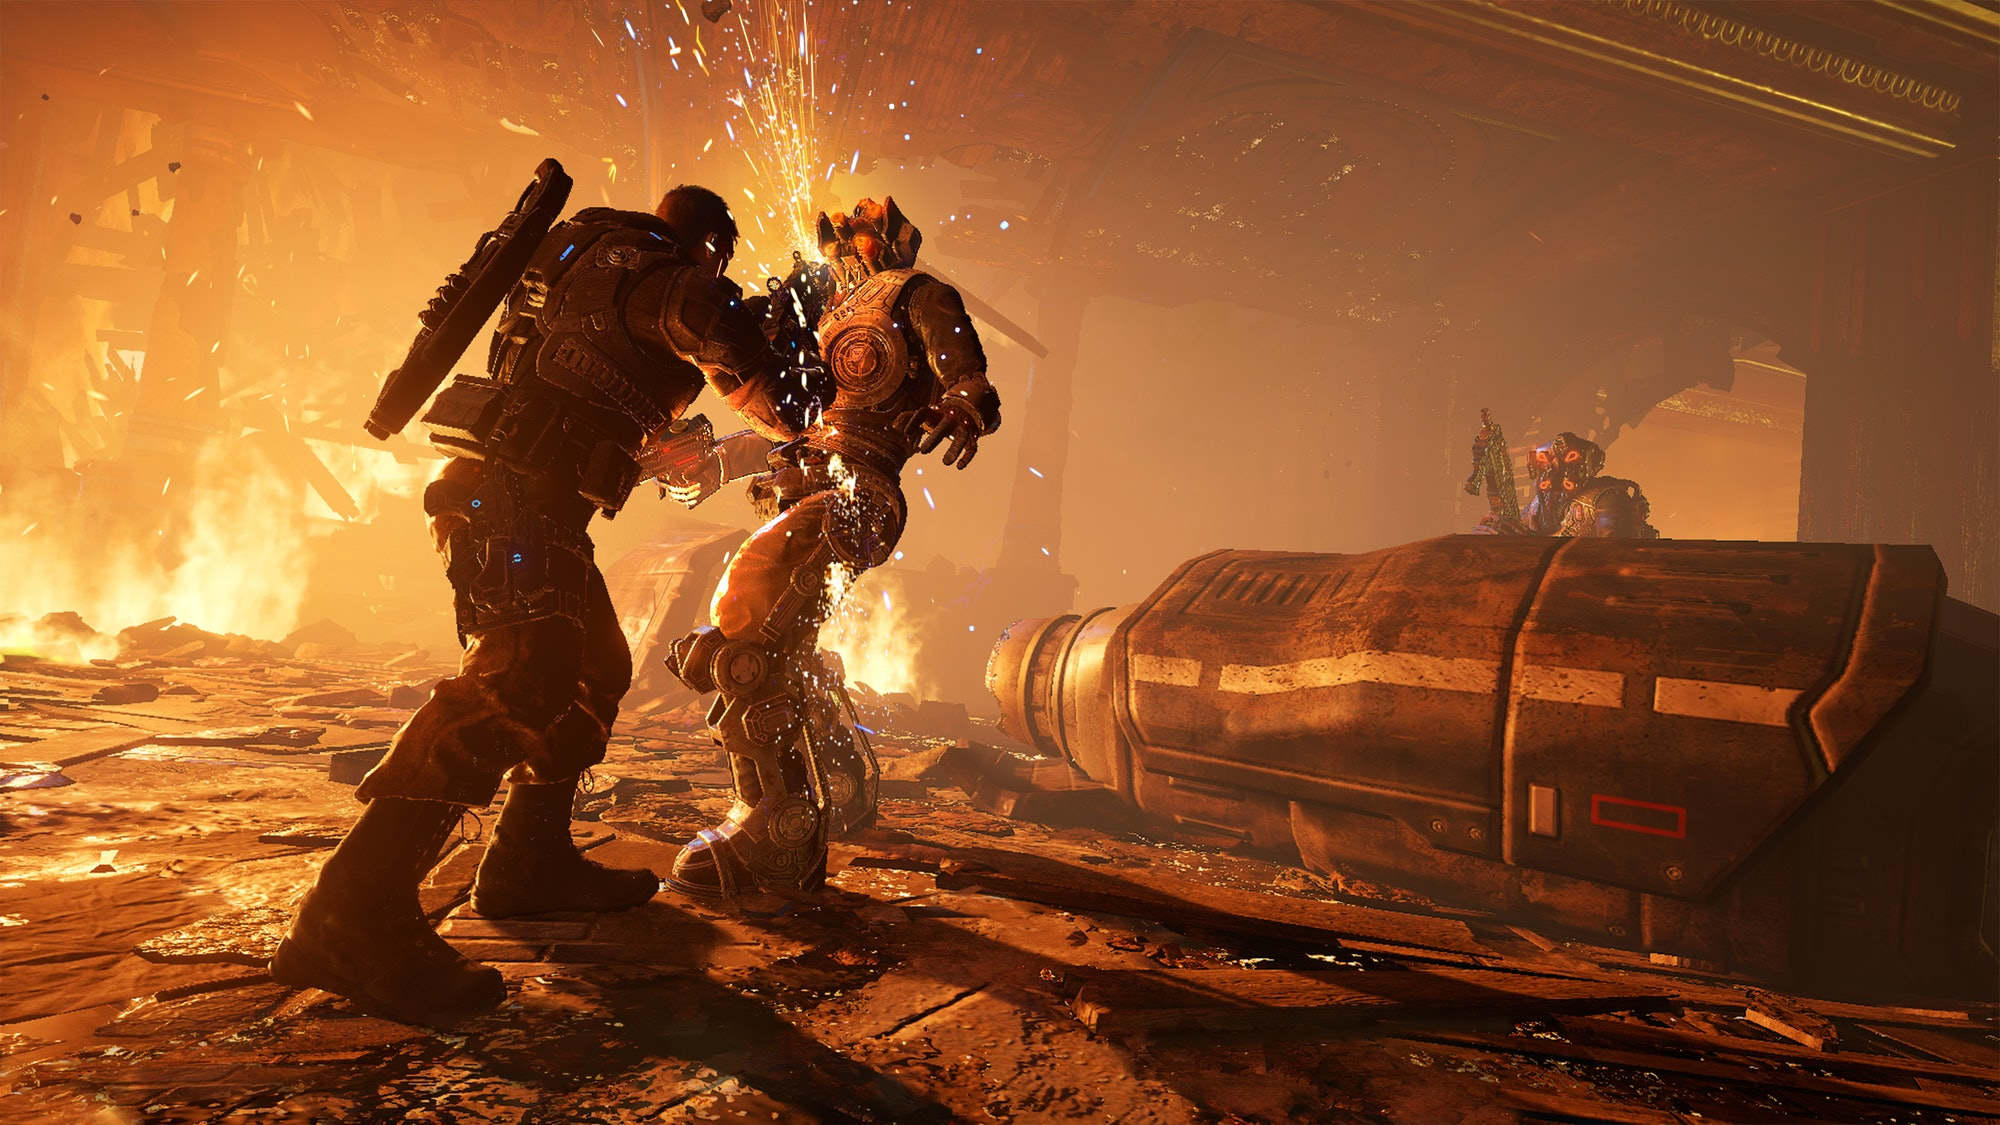 Gears of War 4 JD Fenix Xbox One